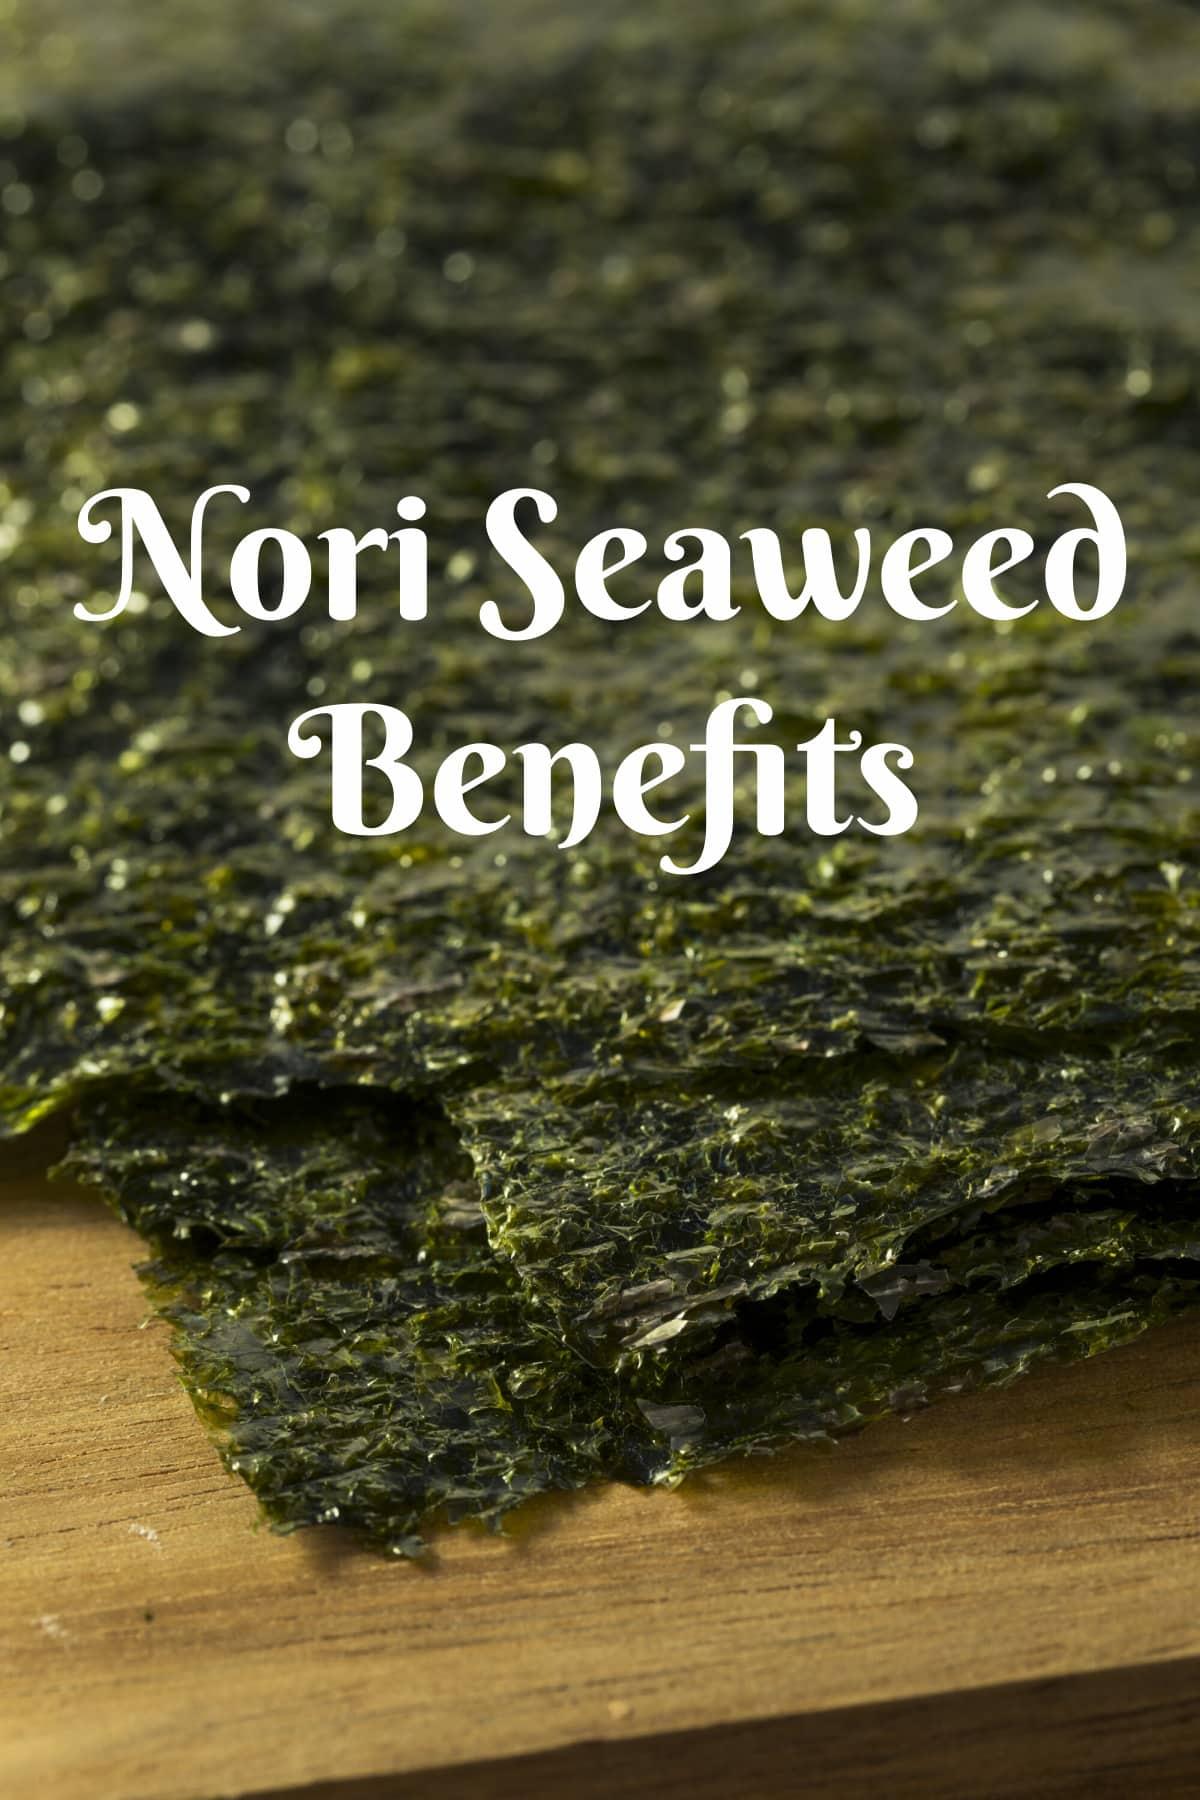 Nori Seaweed Benefits